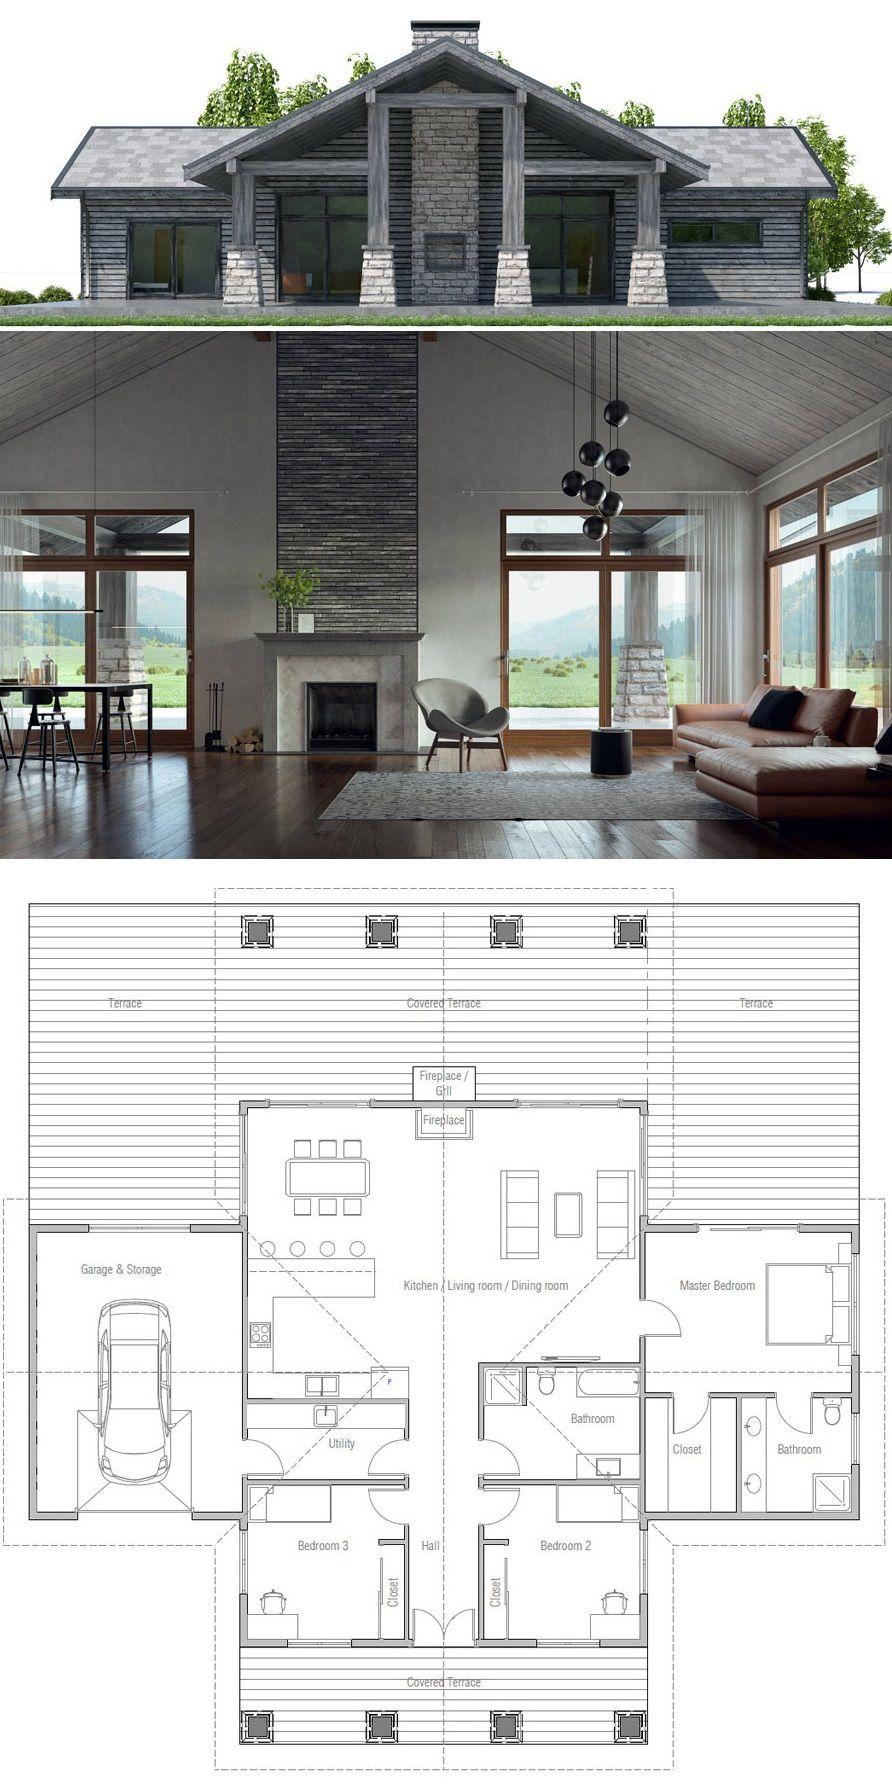 House designs housedesign adhouseplans also floorplan plans rh pinterest